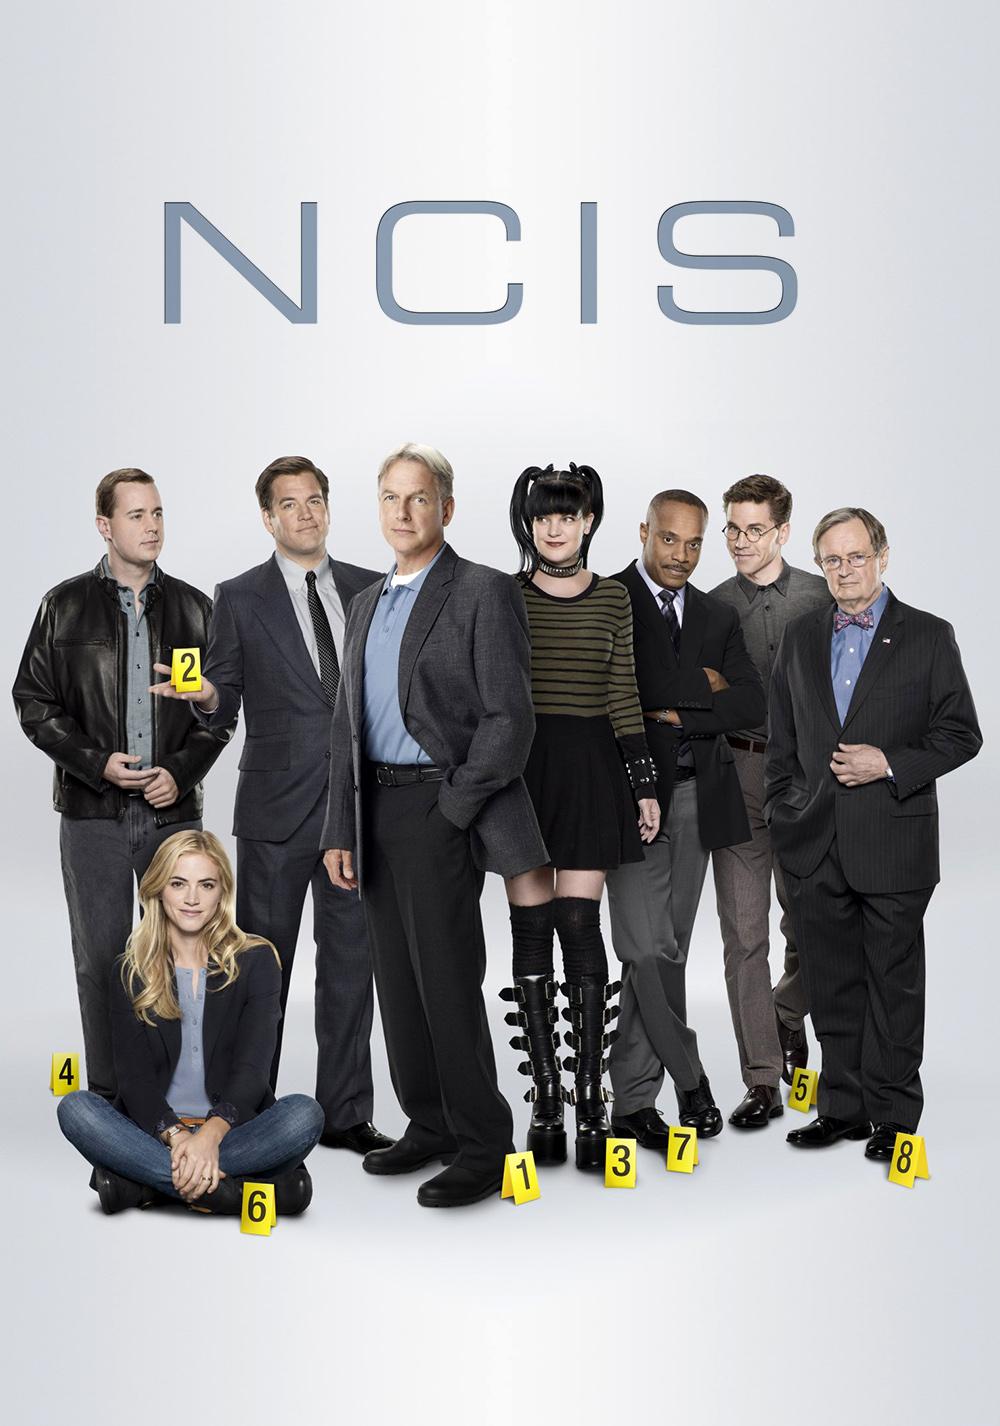 Navy Ncis